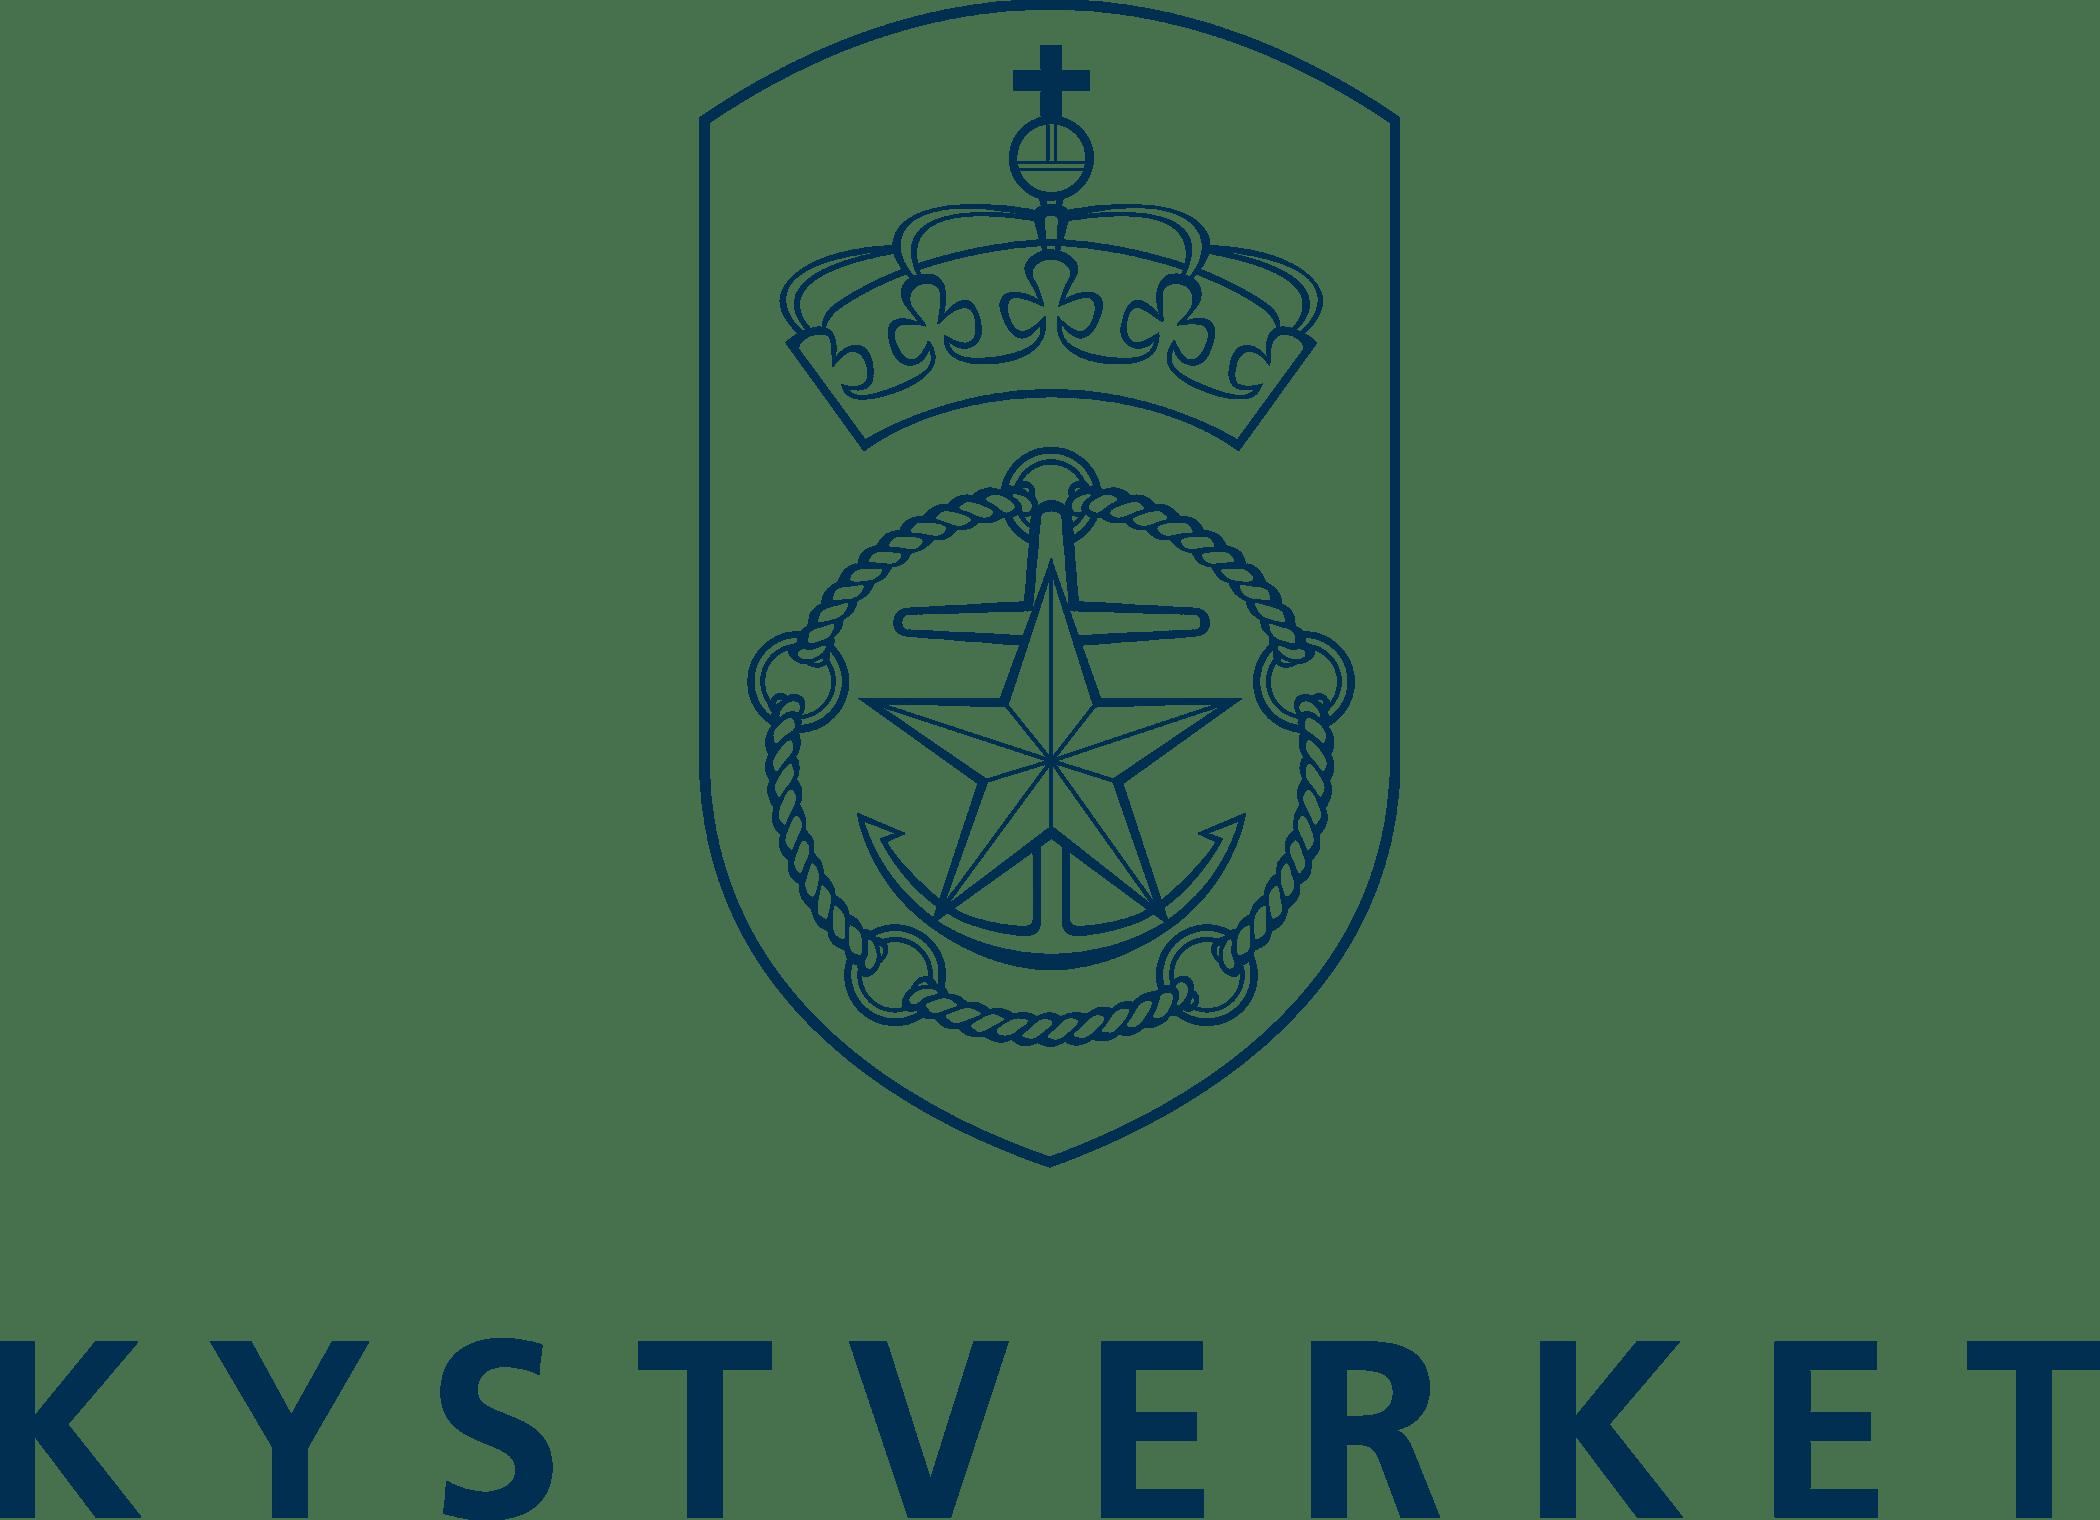 kystverket-primar-cmyk.png